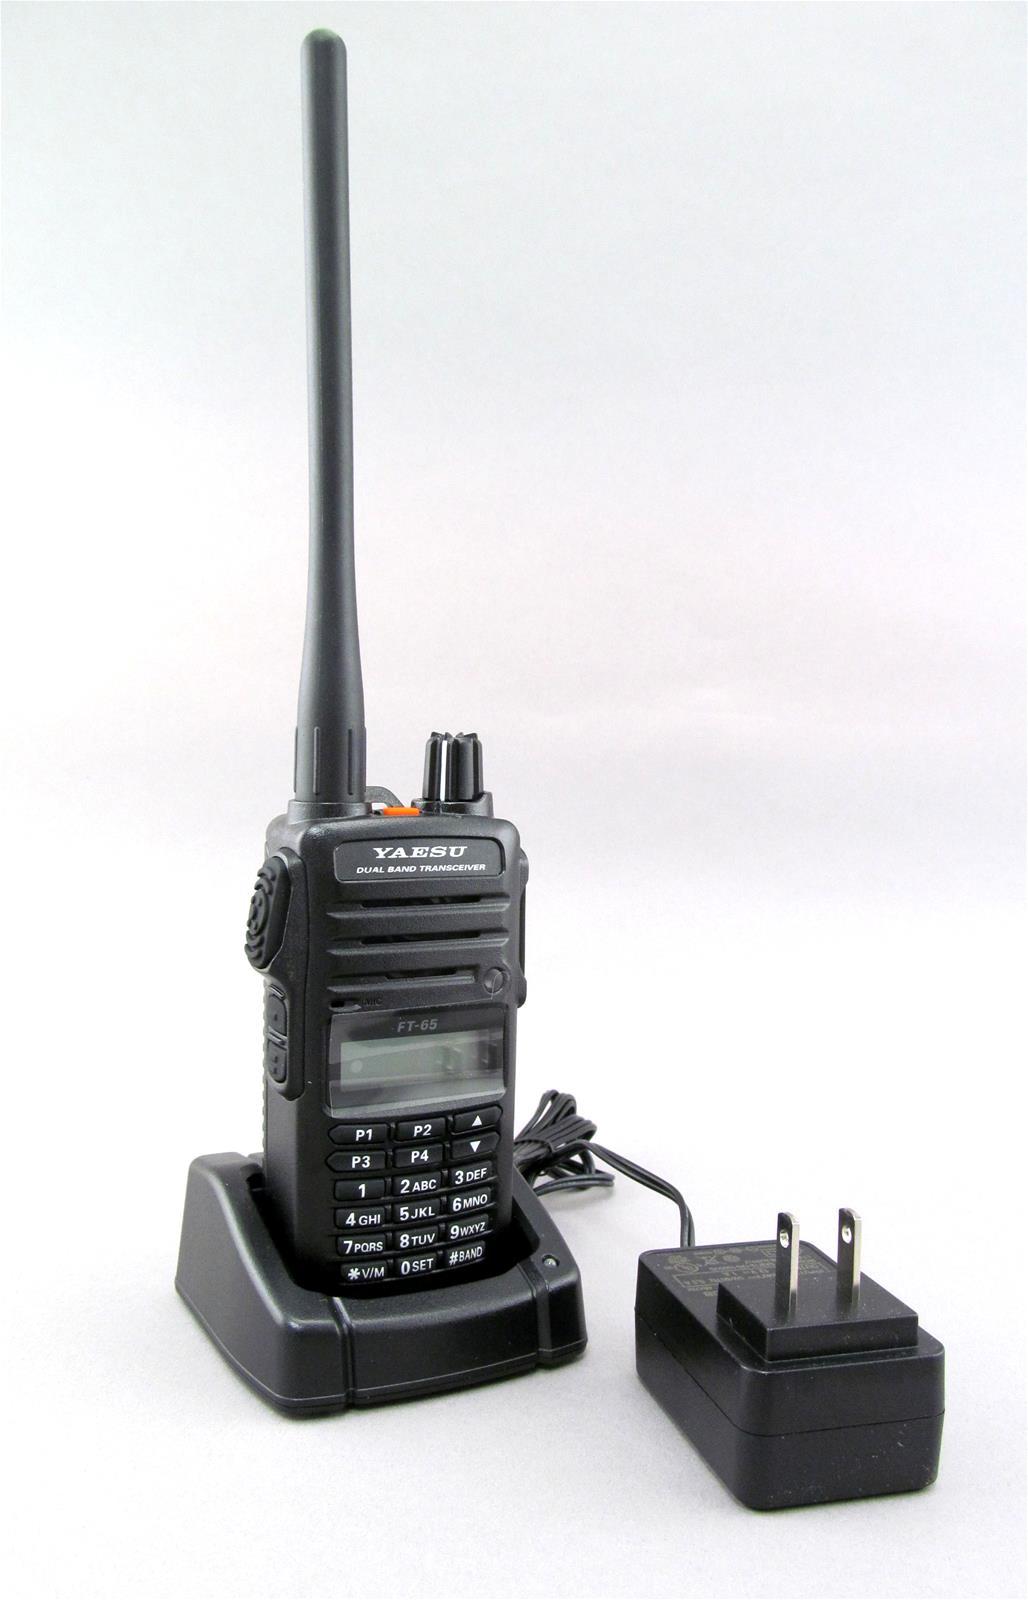 Yaesu FT-65R 144/430 MHz Dual-Band HTs FT-65R